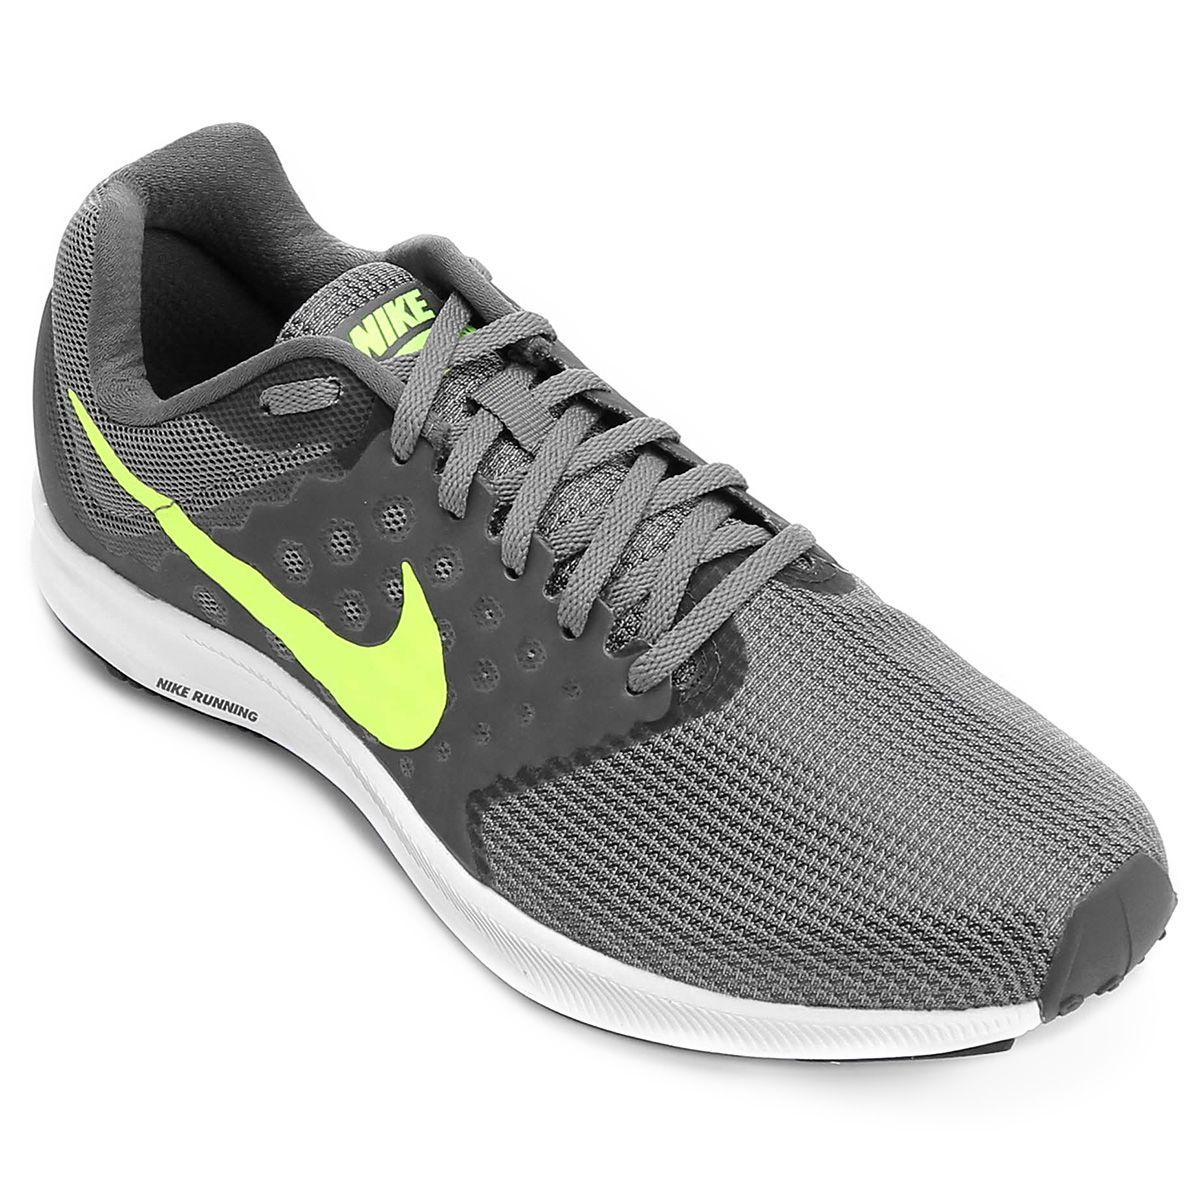 fa694e5a331 Tênis Nike Downshifter 7 Masculino - Cinza e Verde Limão